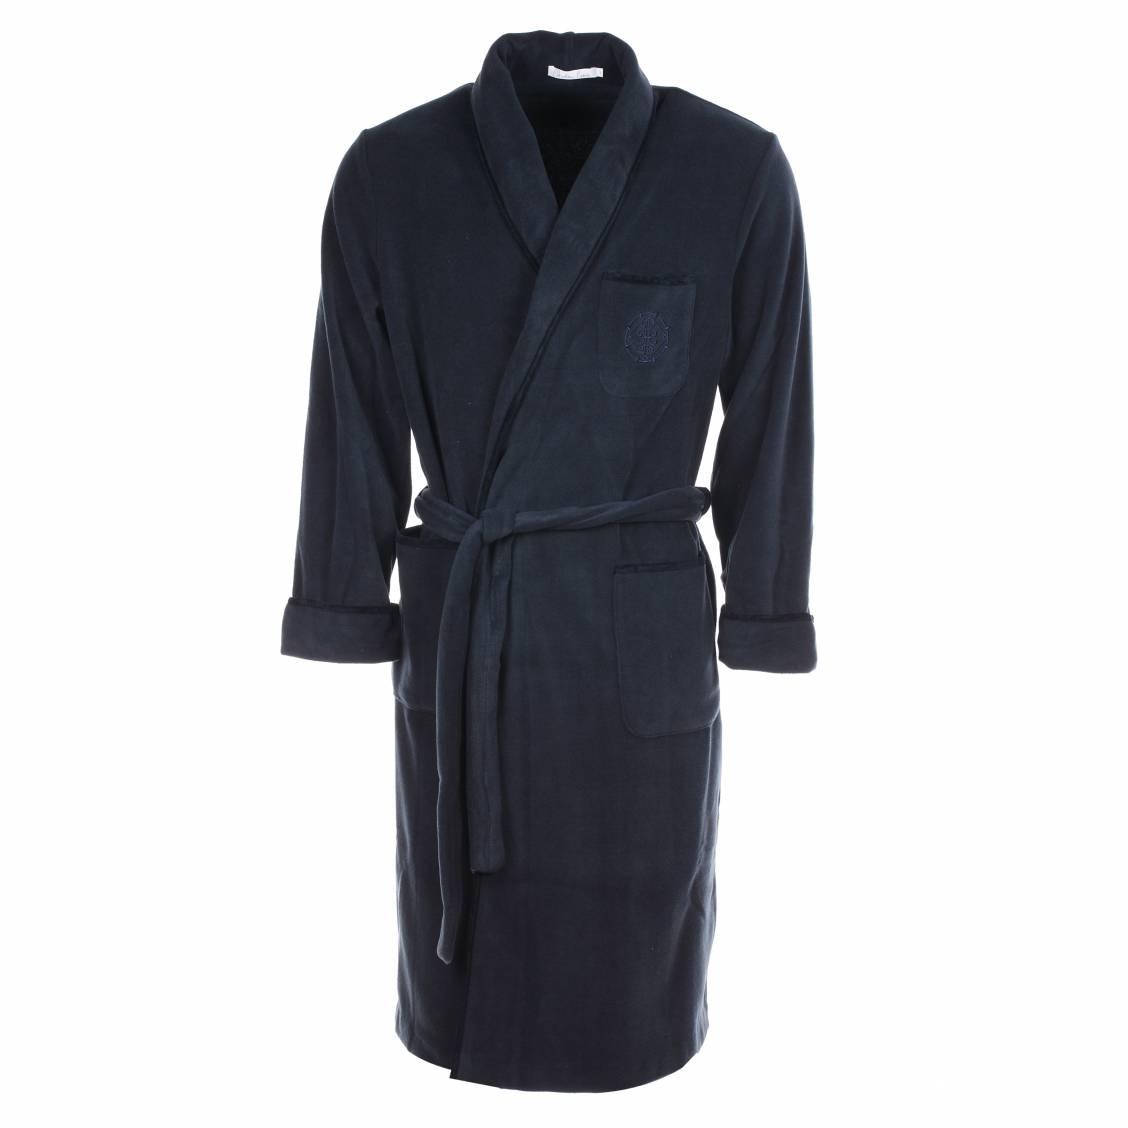 Peignoir homme - Robe de chambre pas cher ...